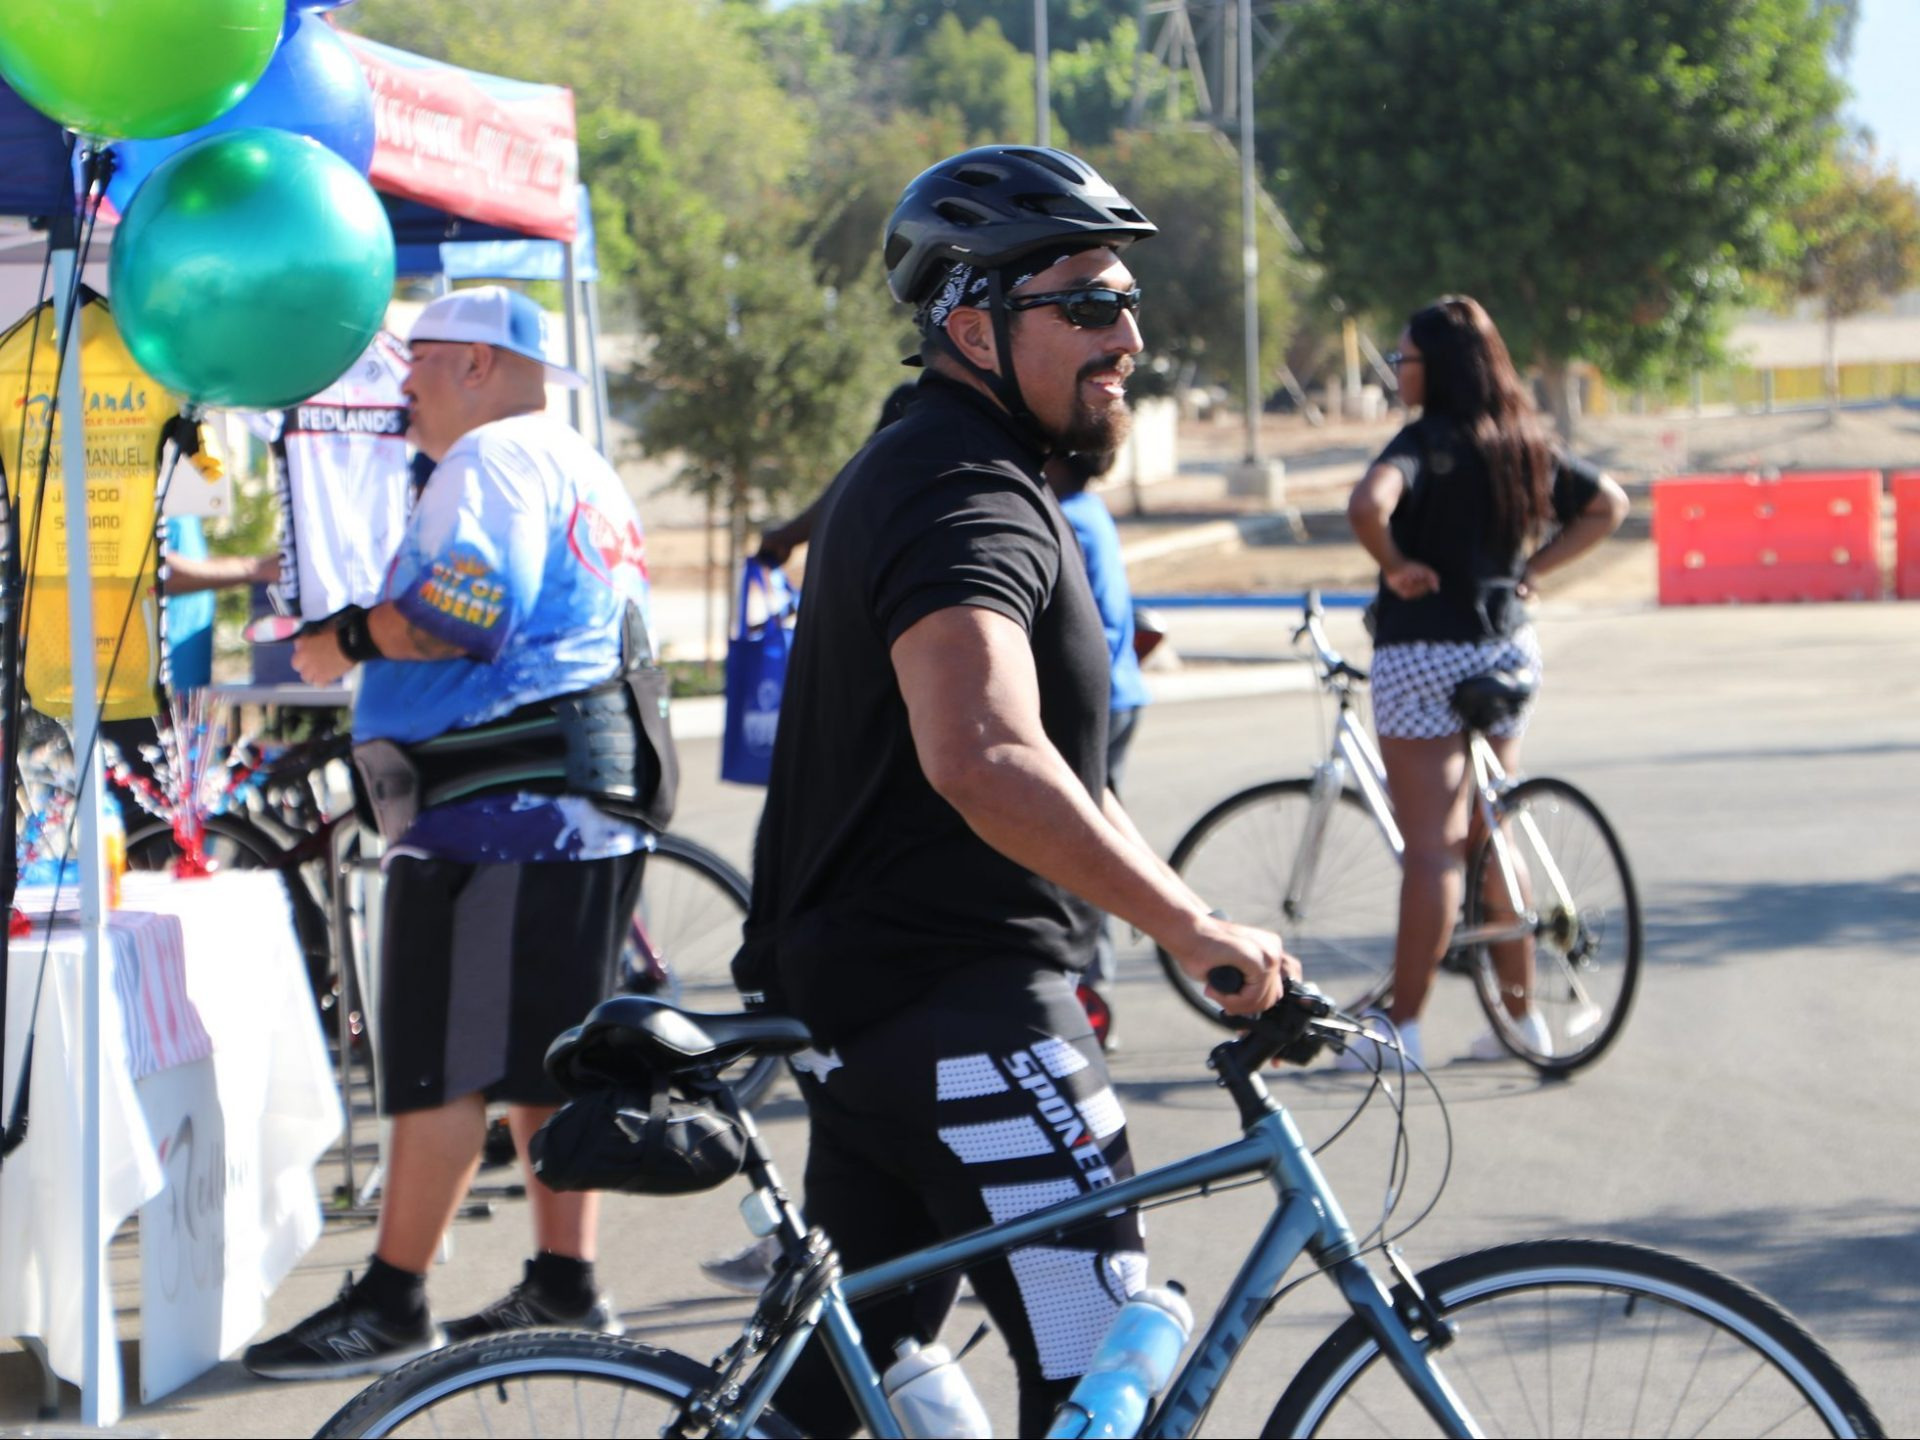 Man holding bike at event